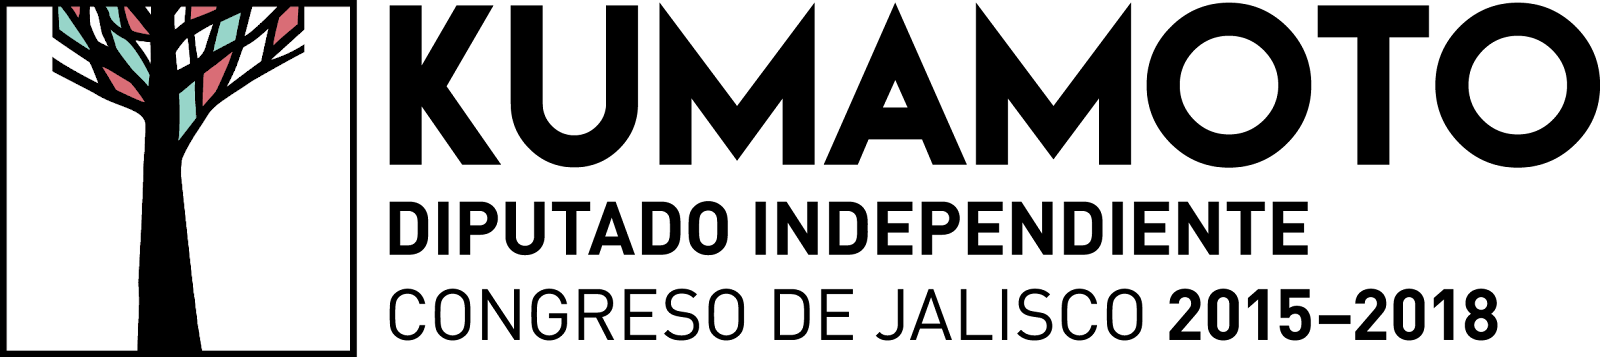 KumamotoDiputado (horizontal).png